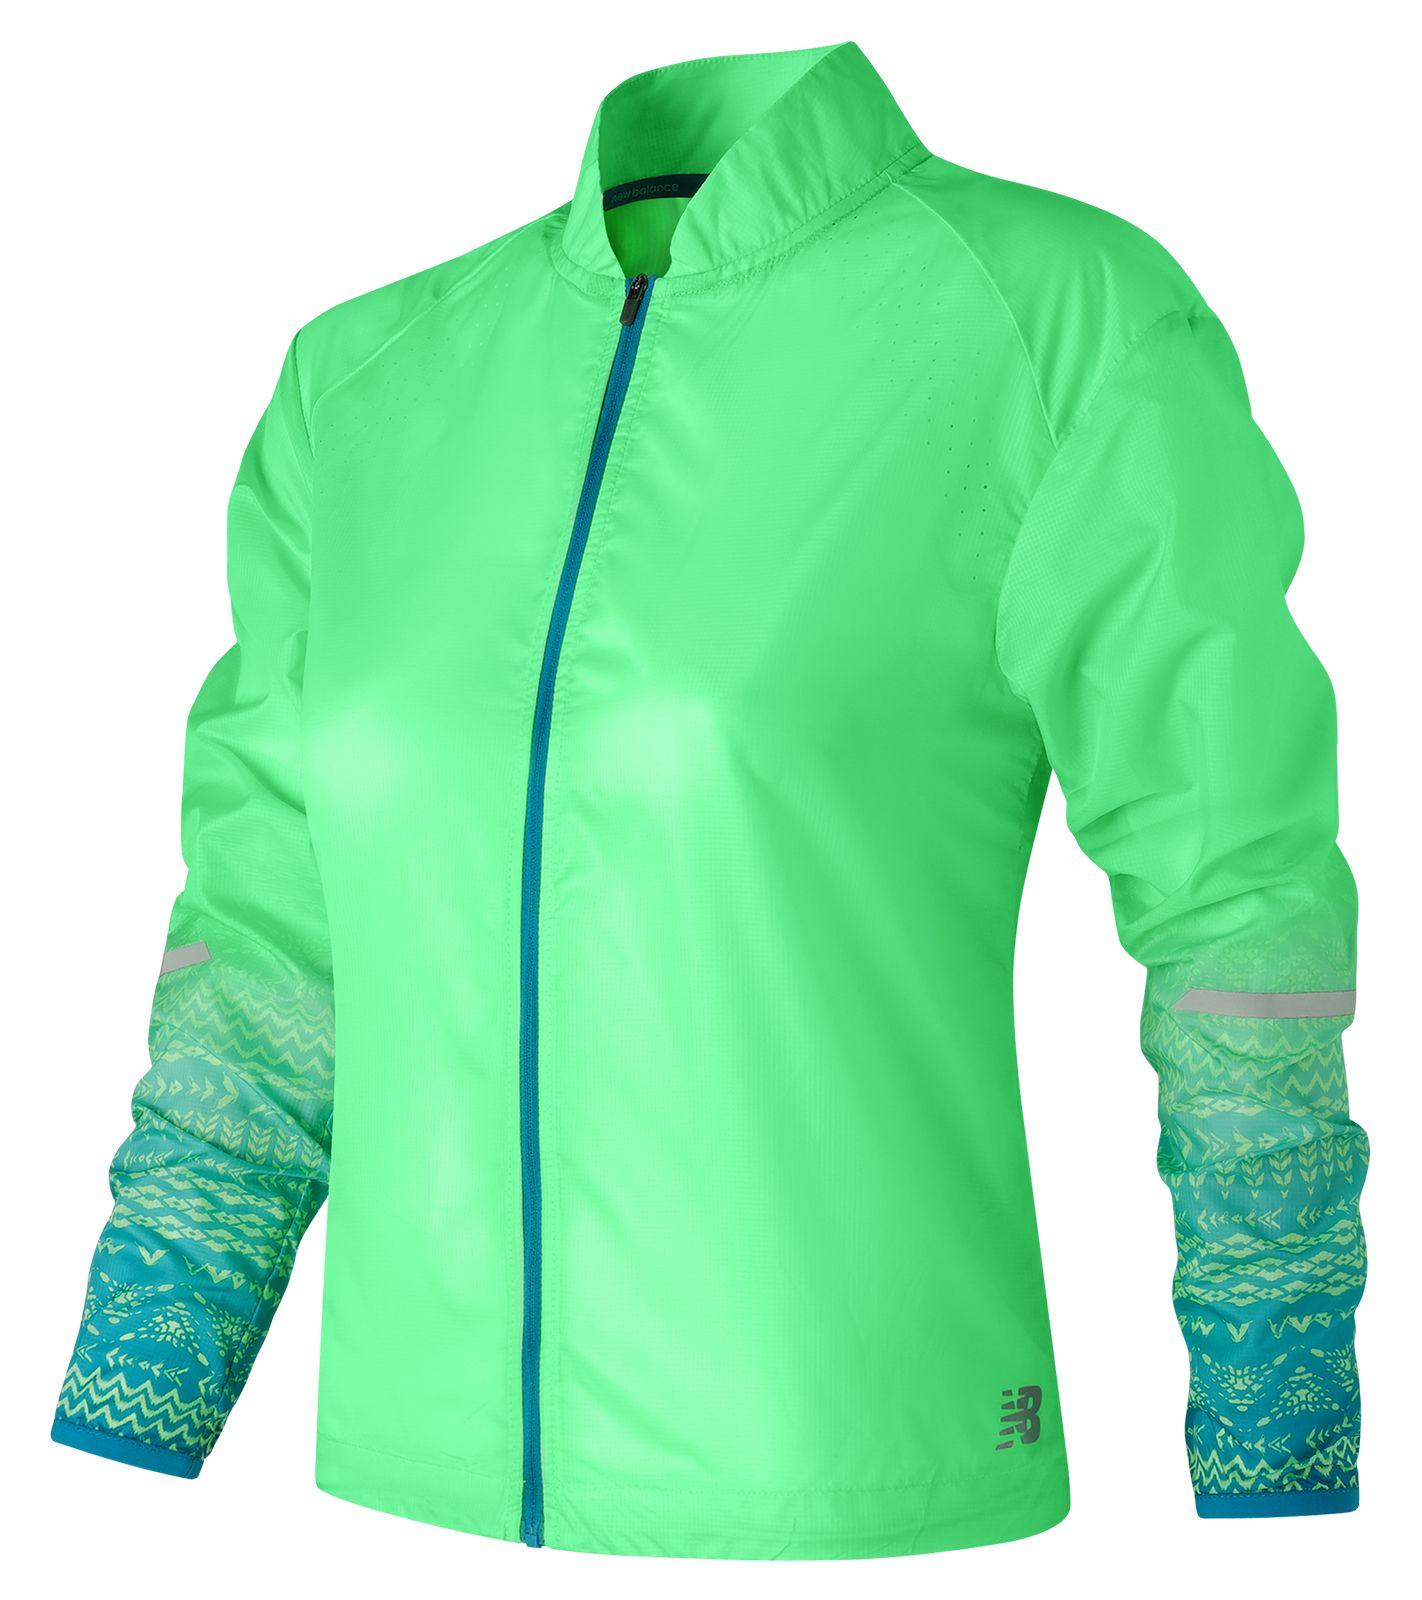 NB Fun Run Jacket, Agave